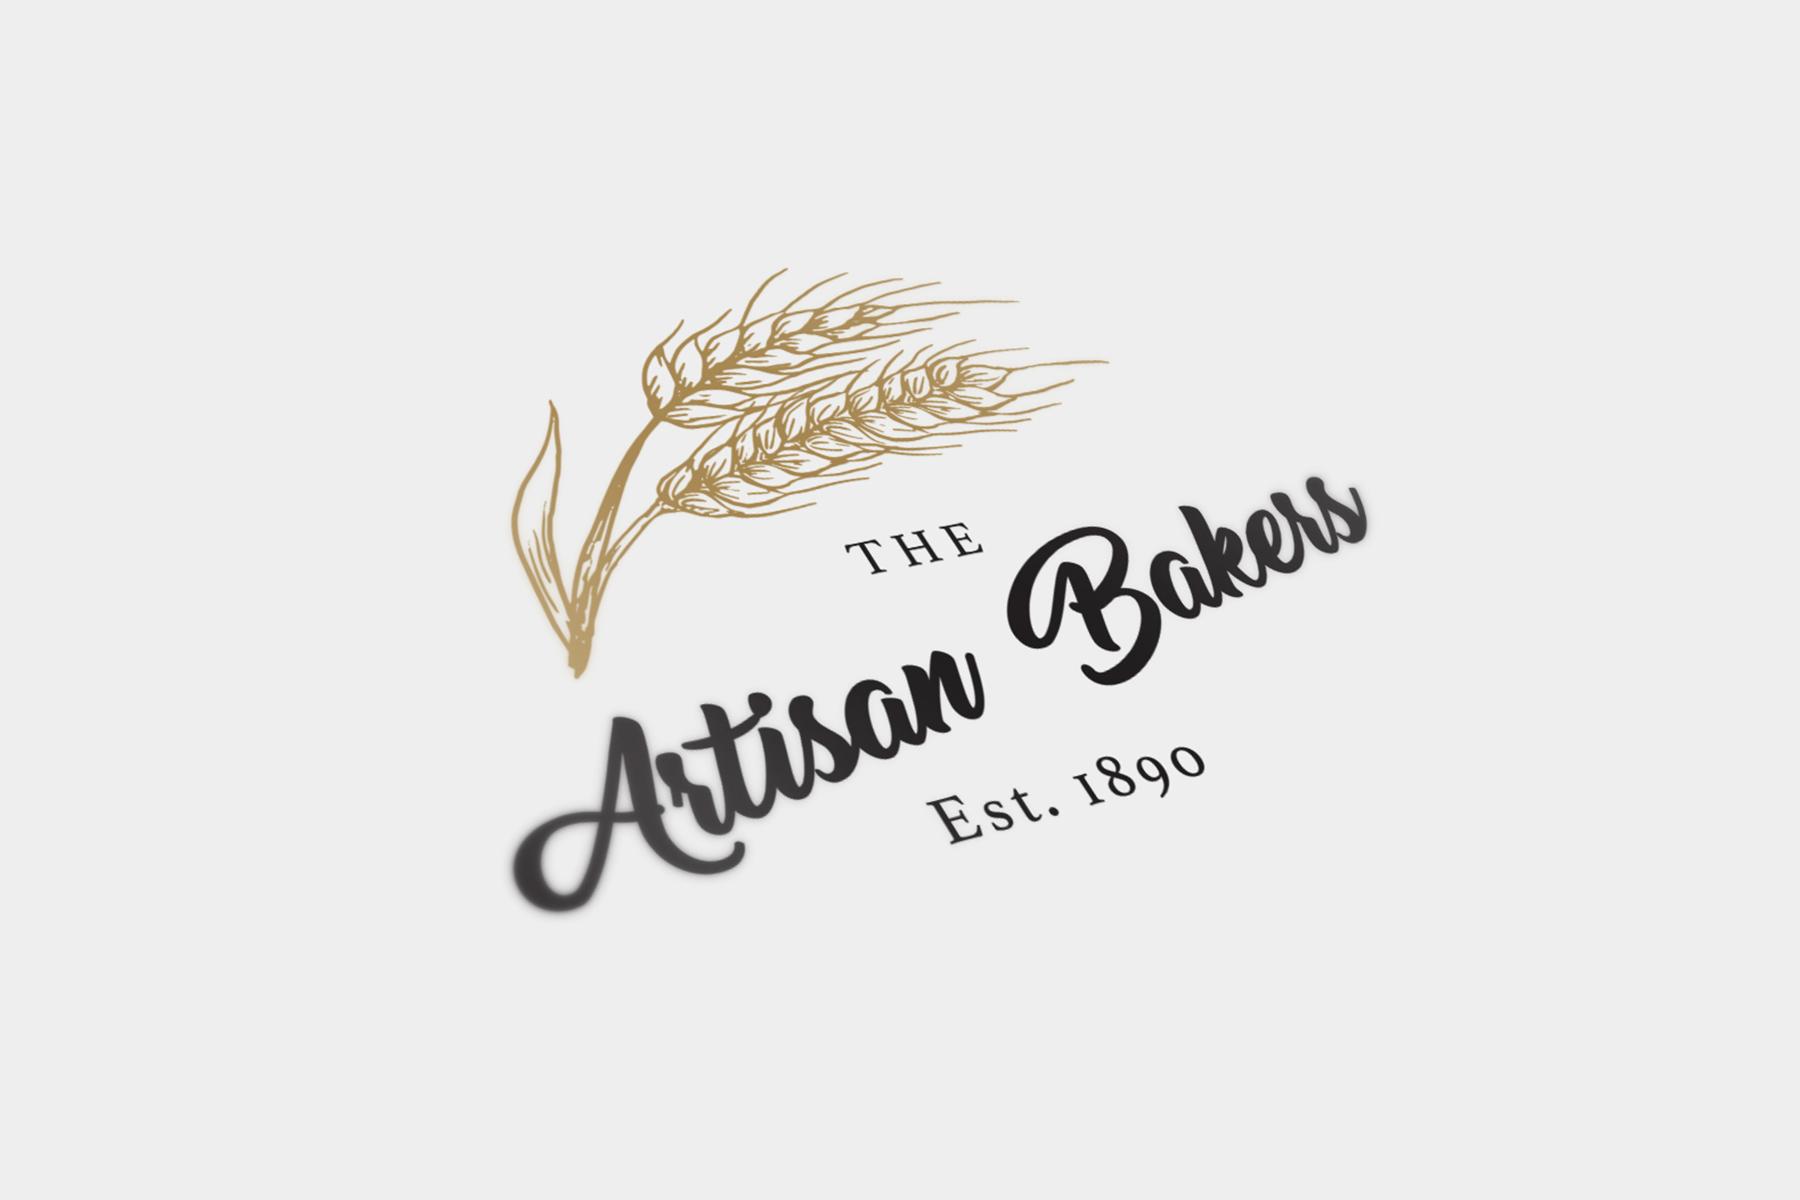 the artisan bakers logo